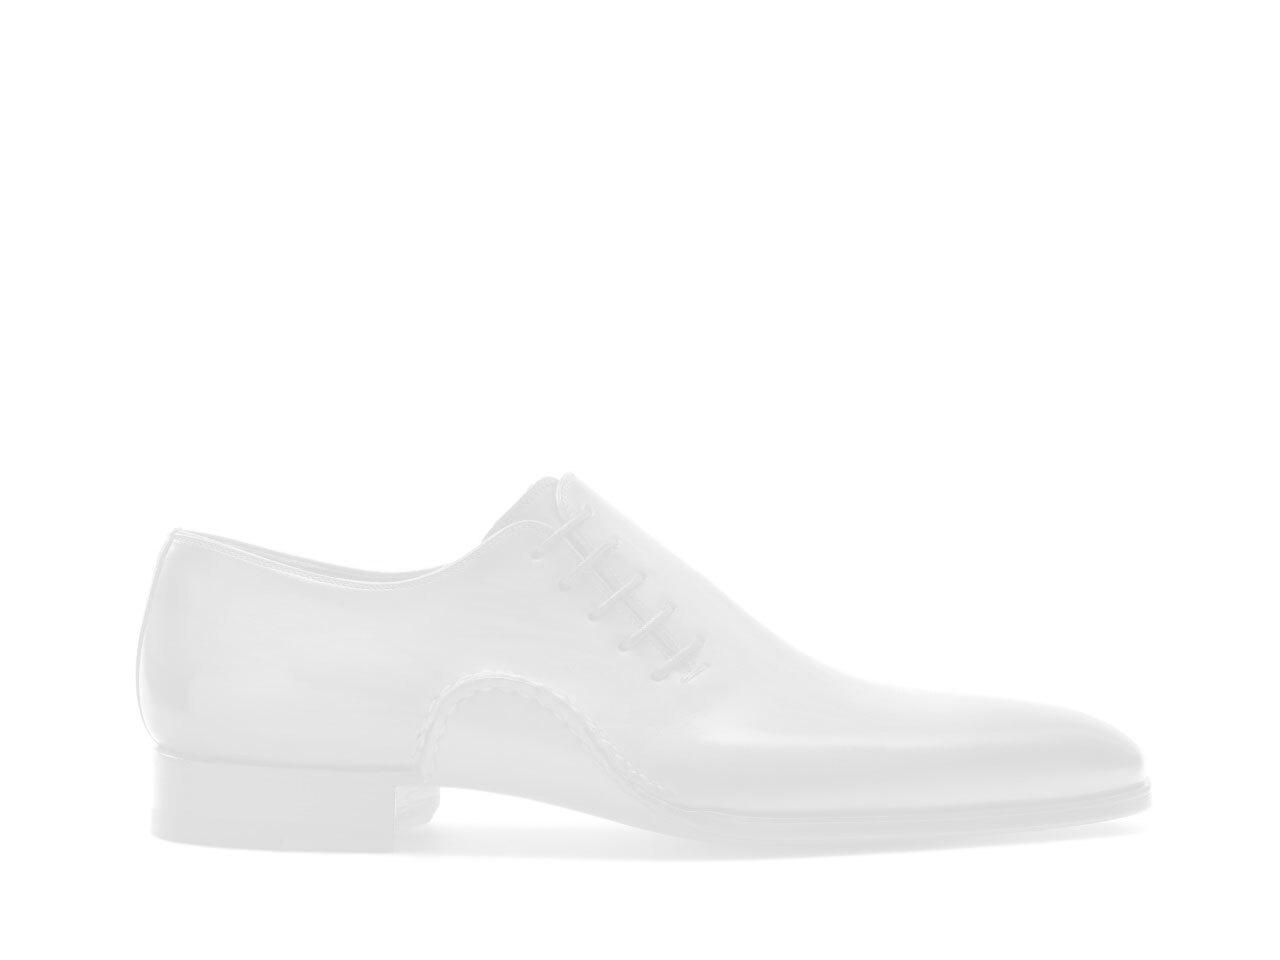 Pair of the Magnanni Ecija II Black and White Men's Sneakers